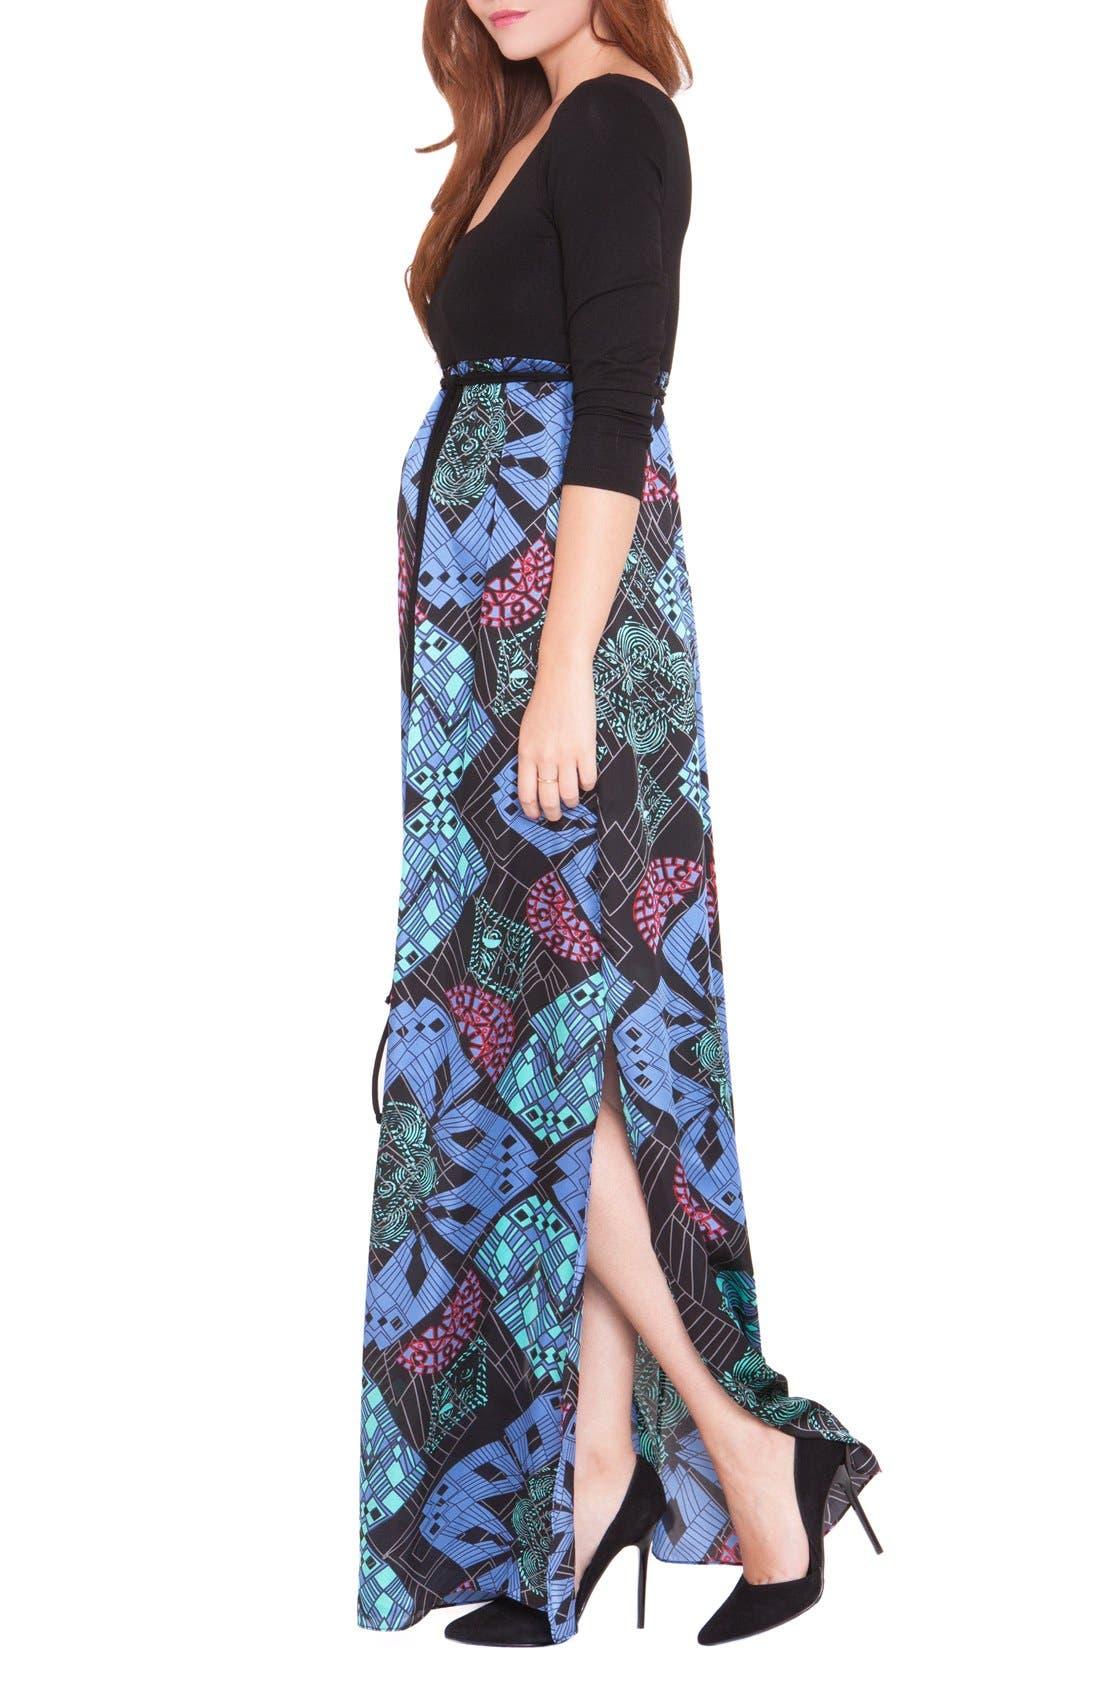 'Samantha' Maternity Maxi Dress,                             Alternate thumbnail 4, color,                             BLUE